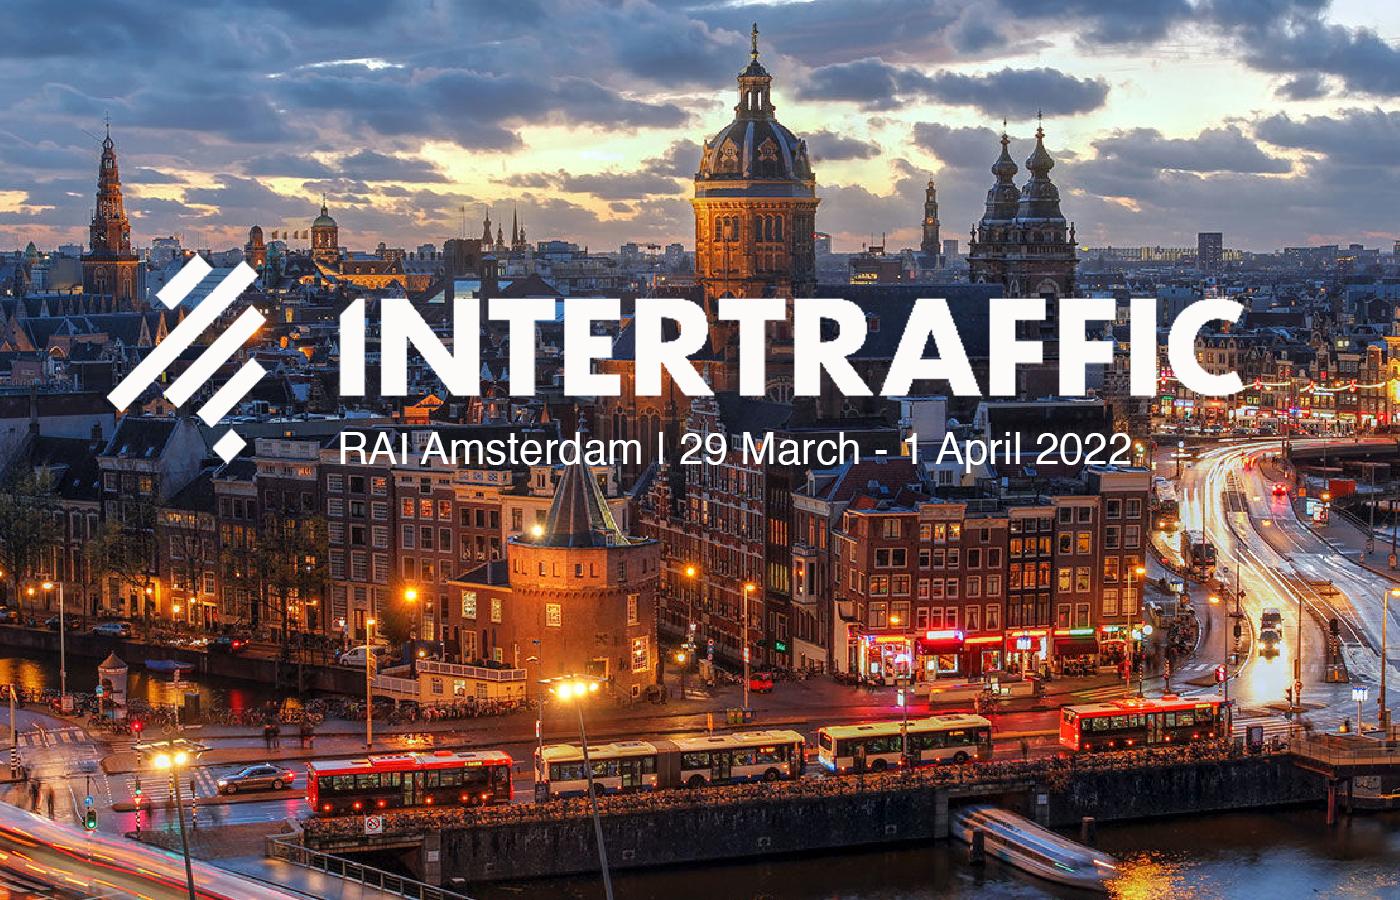 Selea at Intertraffic Amsterdam 2022